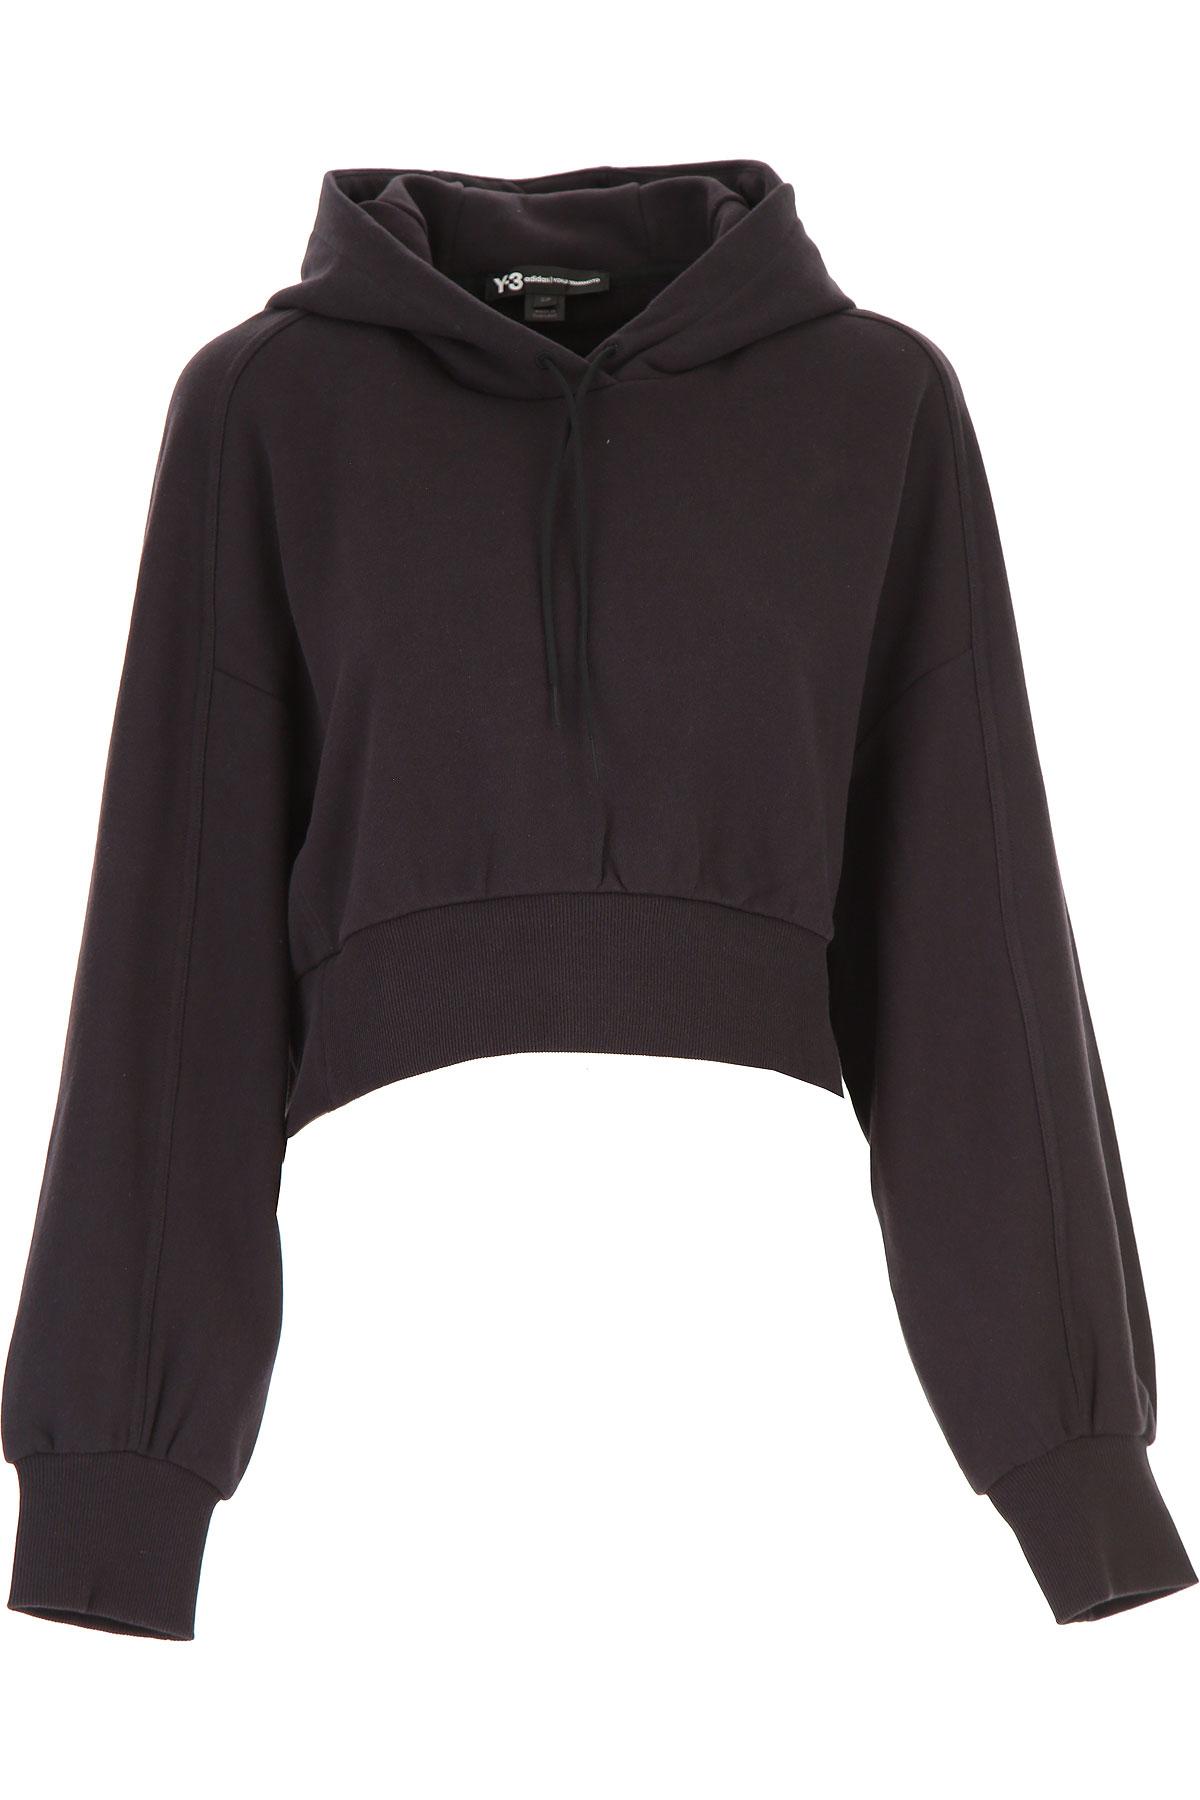 Y3 by Yohji Yamamoto Sweatshirt for Women On Sale, Black, Cotton, 2019, 4 6